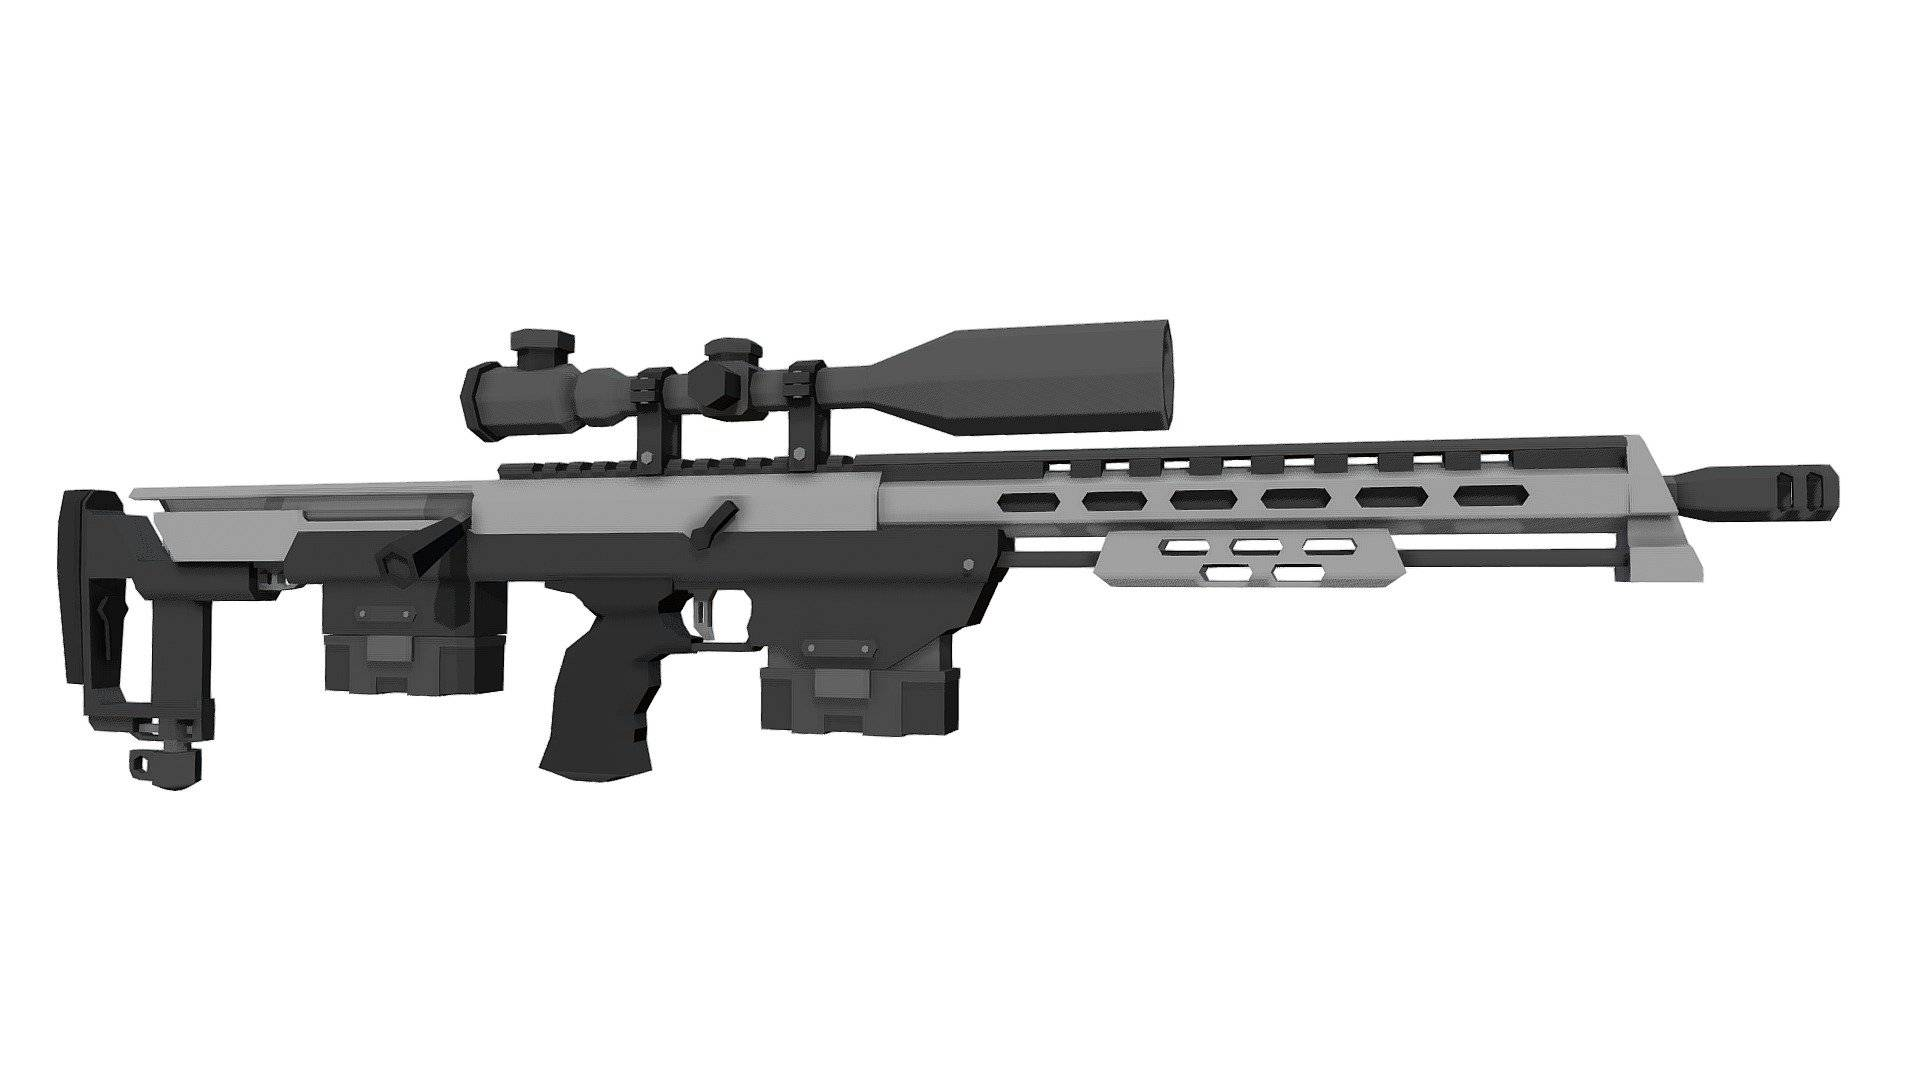 Снайперская винтовка dsr-precision dsr-1 - все моды на stalker - зов припяти - stalker - зов припяти - моды, патчи, аддоны, файлы - всё для stalker, моды сталкер, файлы stalker, торрент